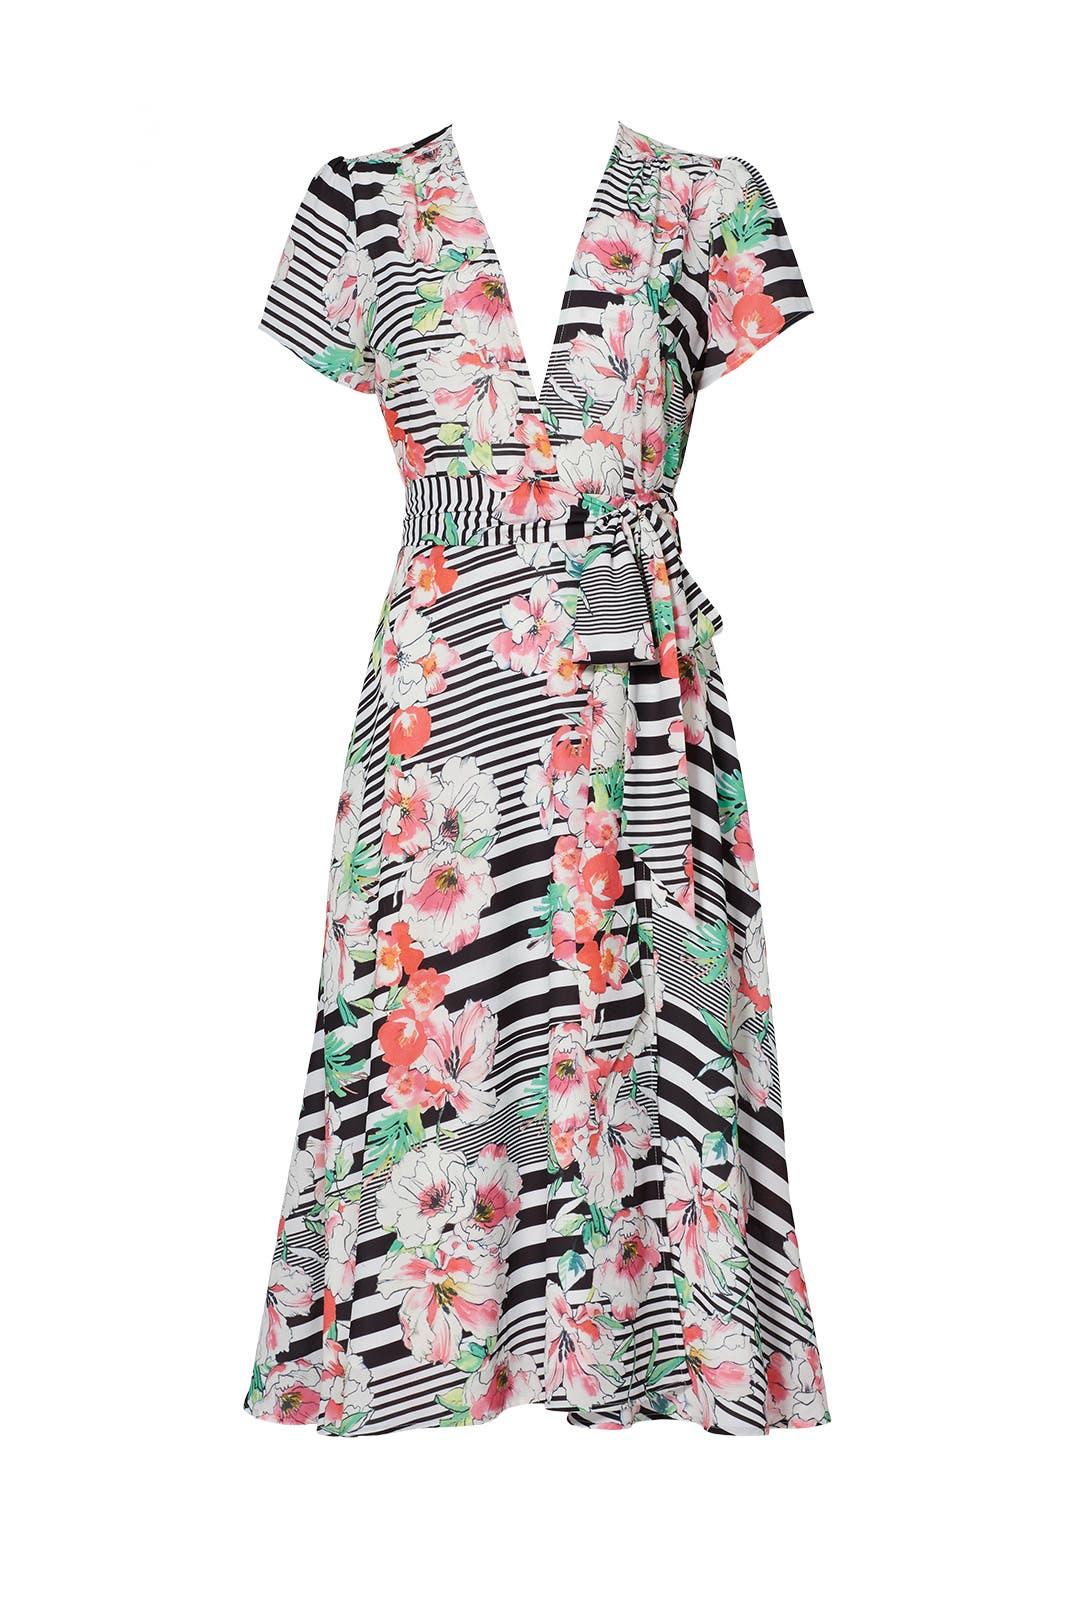 Spin around Dress